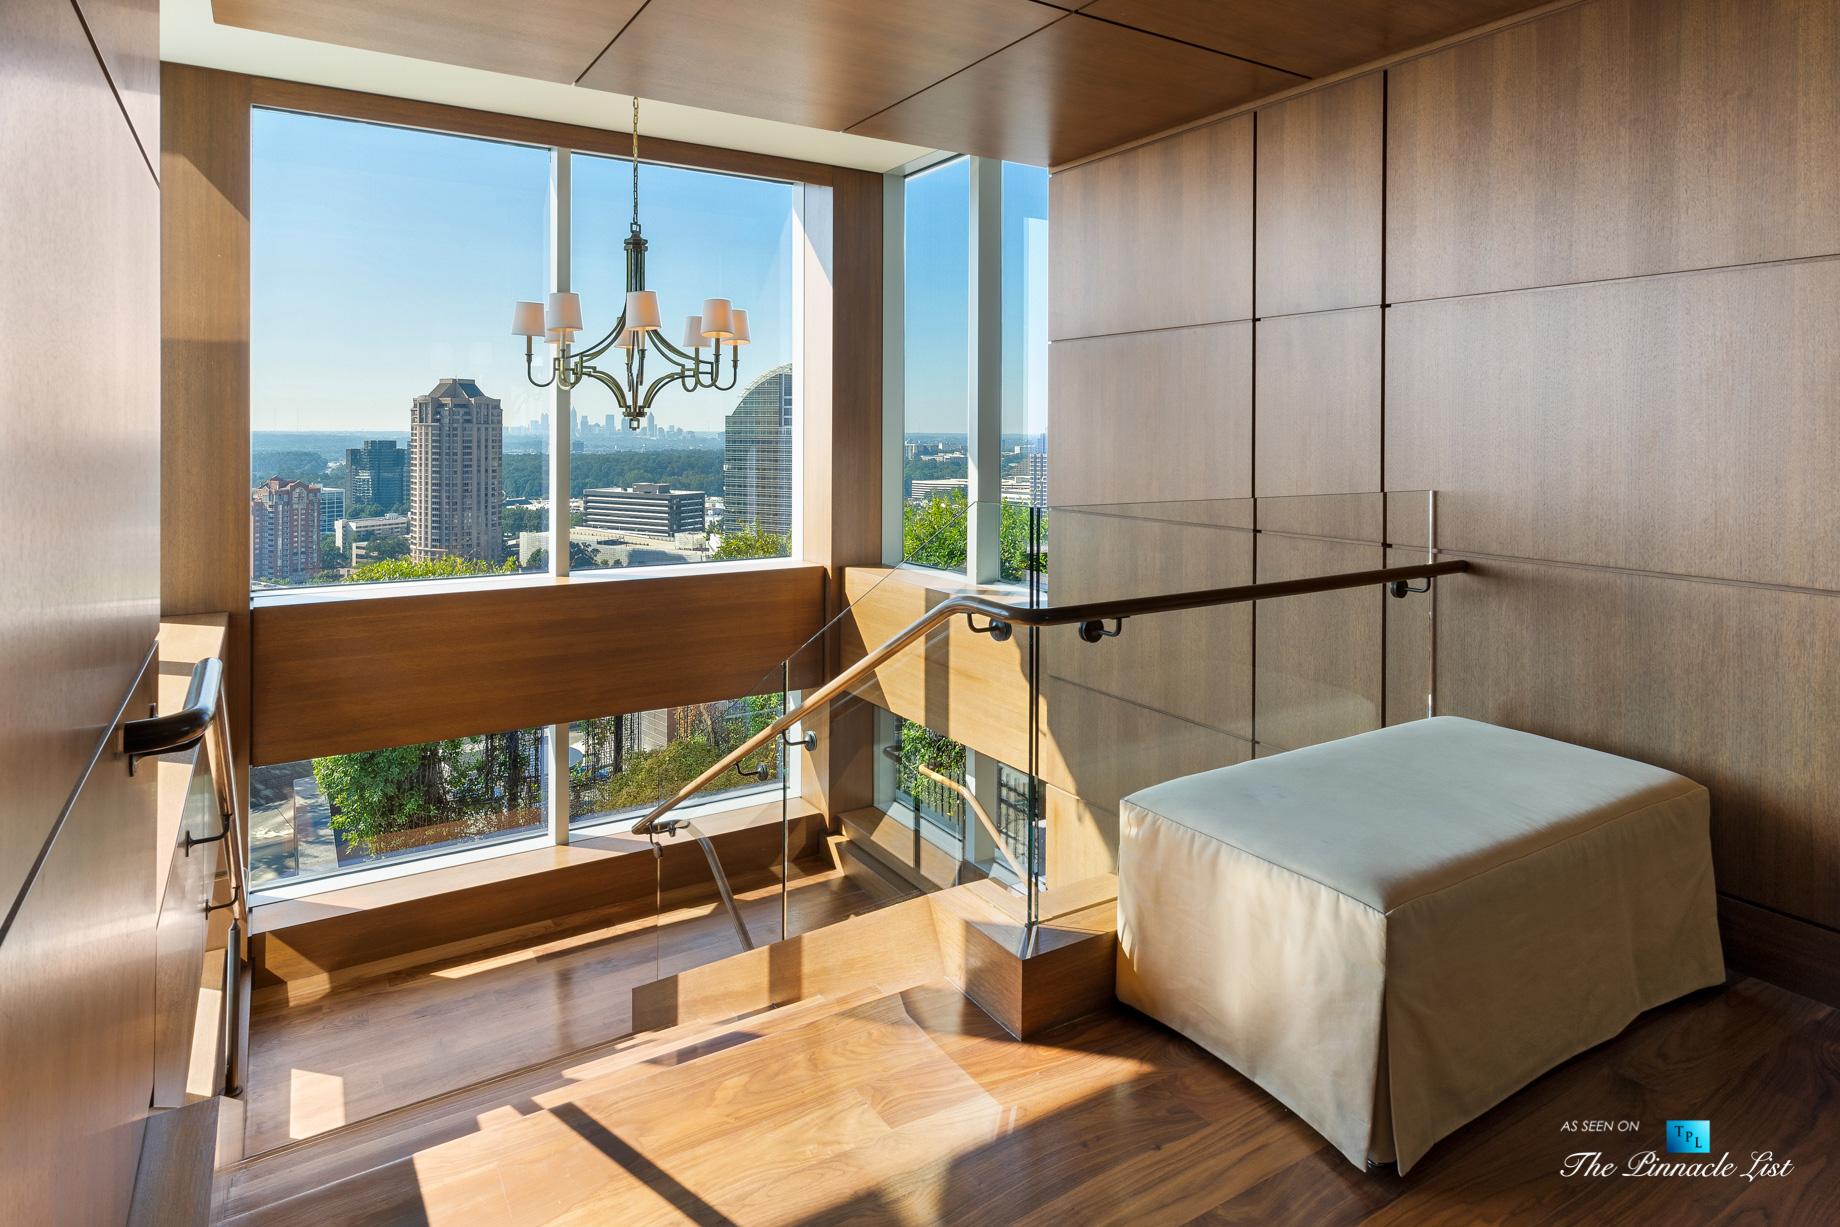 3630 Peachtree Rd NE, Unit 2808, Atlanta, GA, USA – Condo Amenity Room Entrance – Luxury Real Estate – The Ritz-Carlton Residences Buckhead